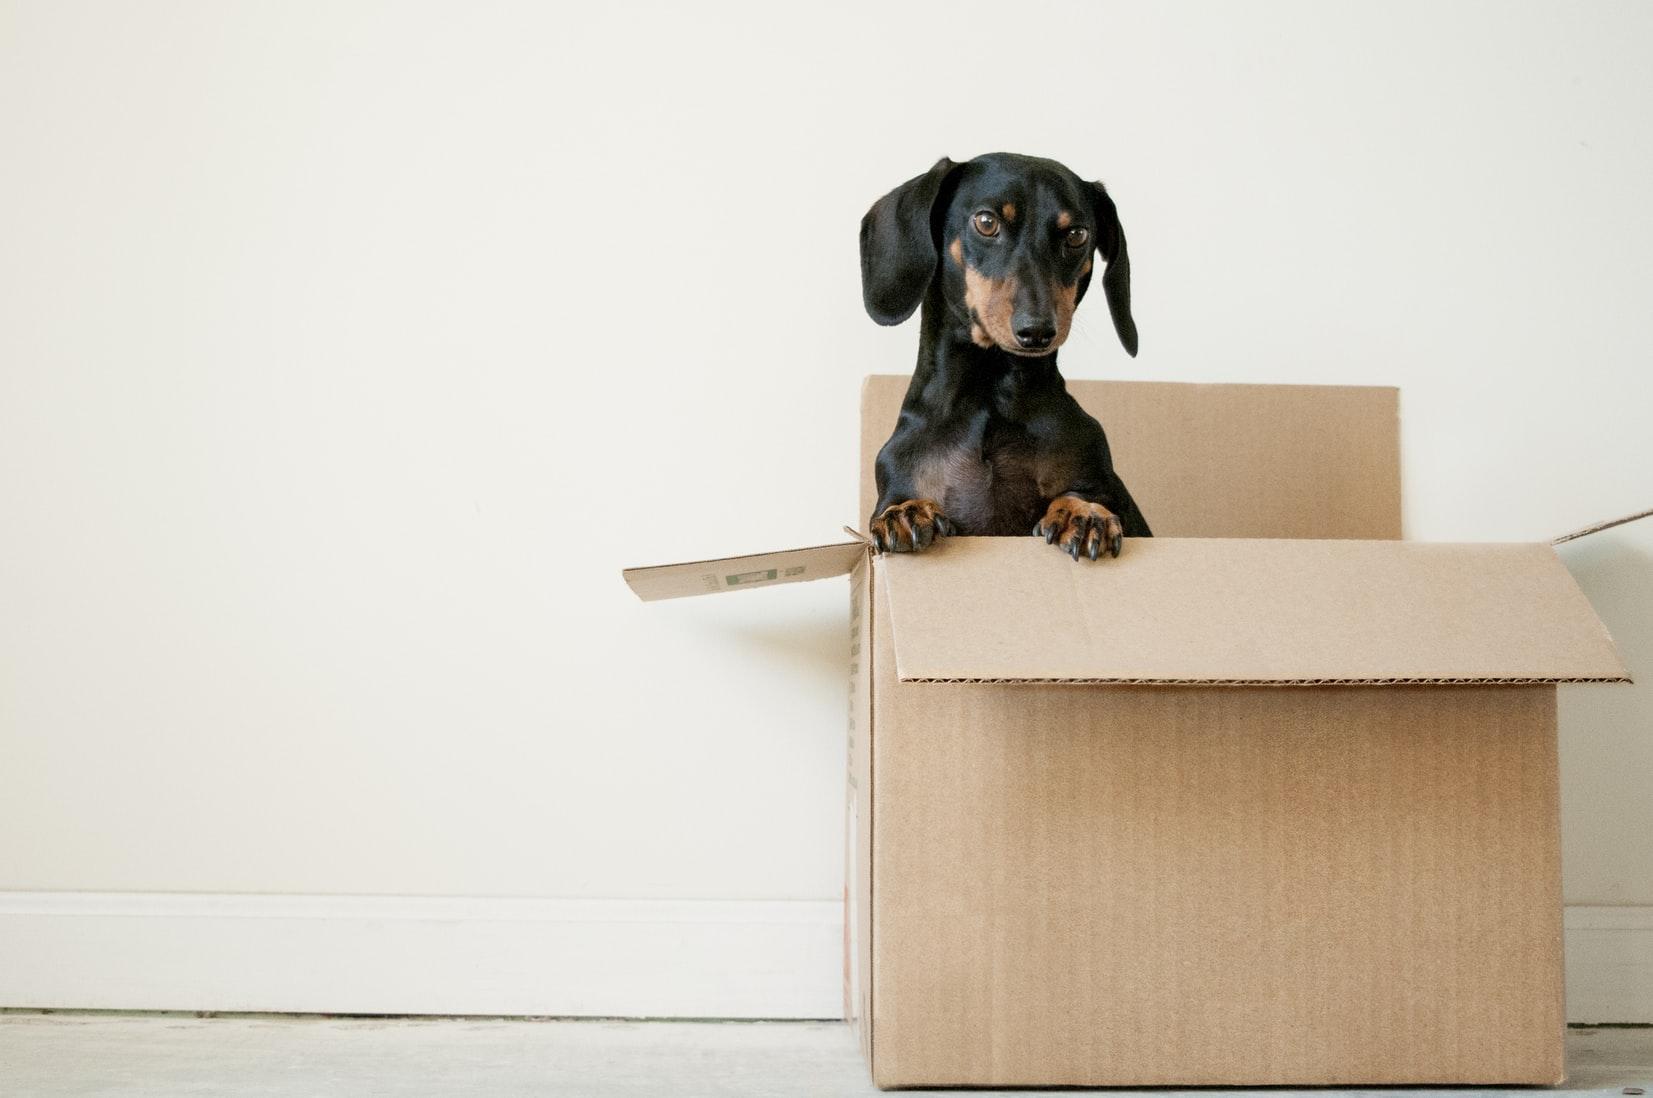 Dropbox - Dog in a Box